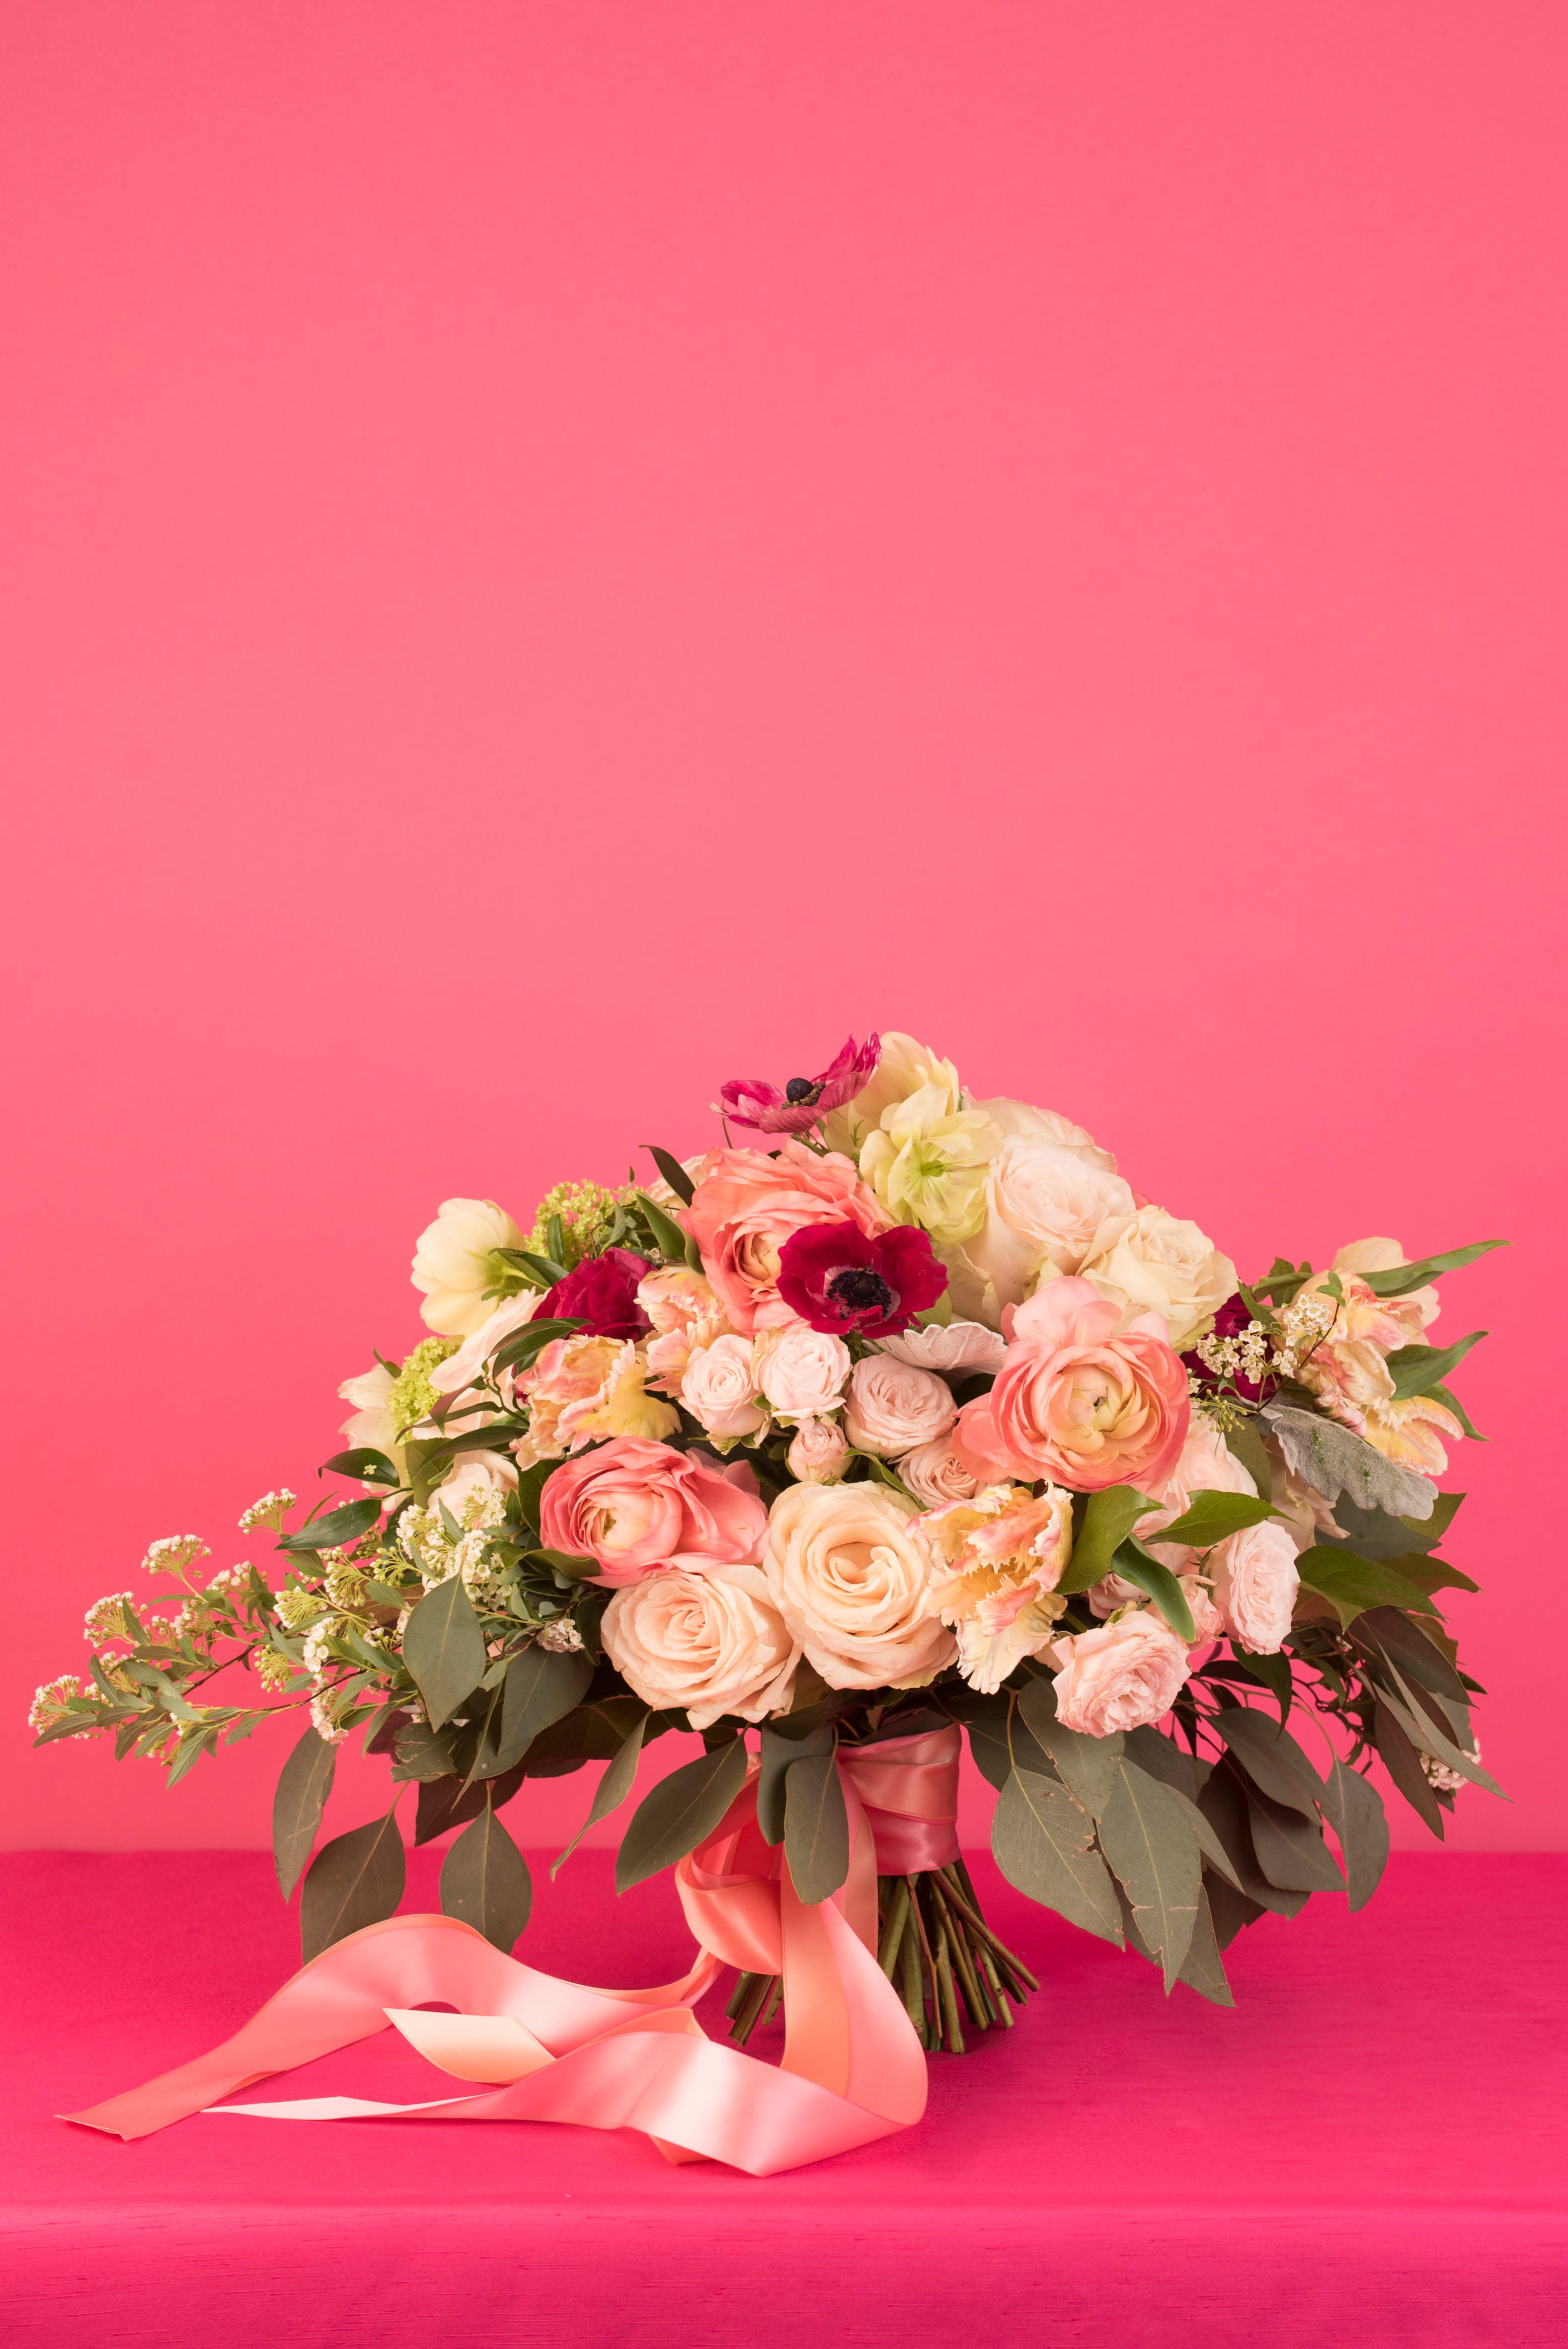 Find a wedding florist for bouquets in Bergen NJ